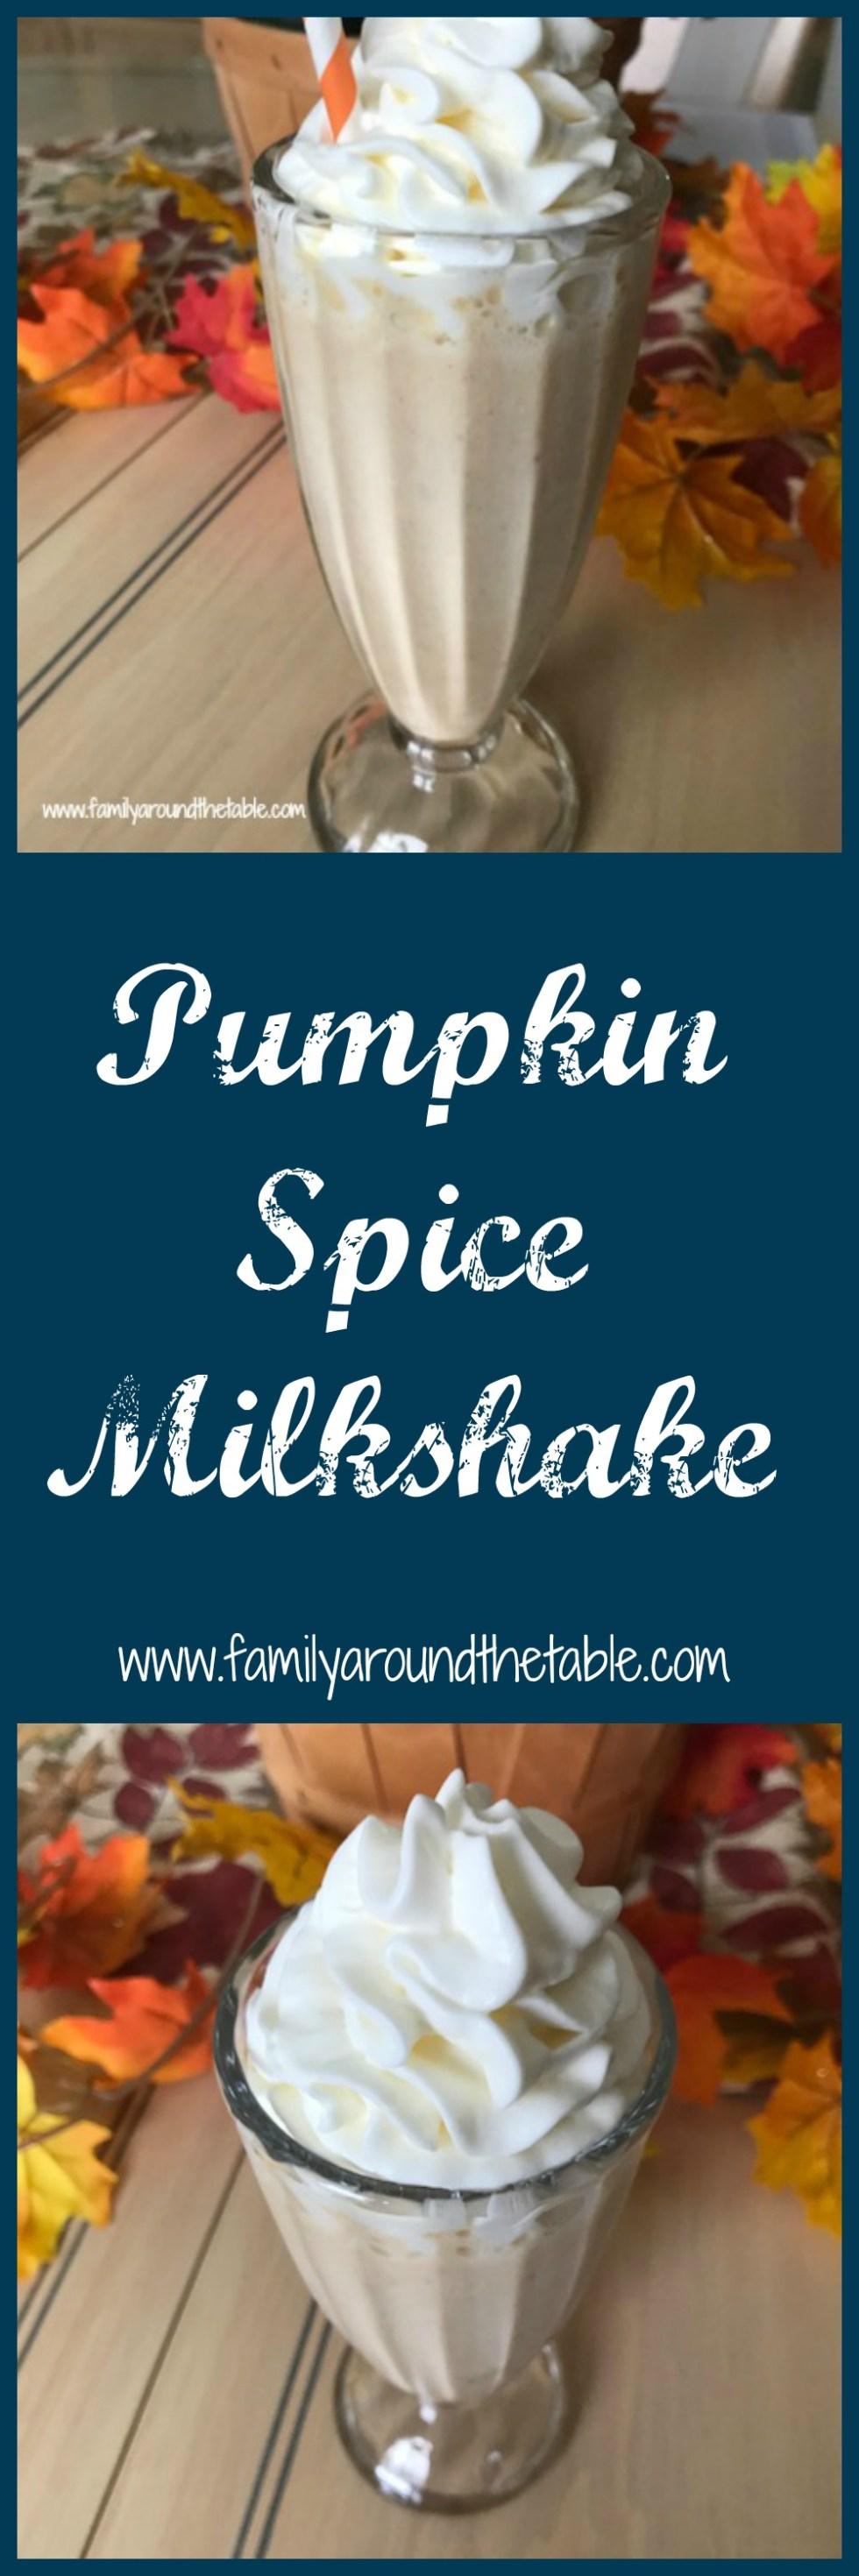 Pumpkin Spice Milkshake is a delicious fall treat.